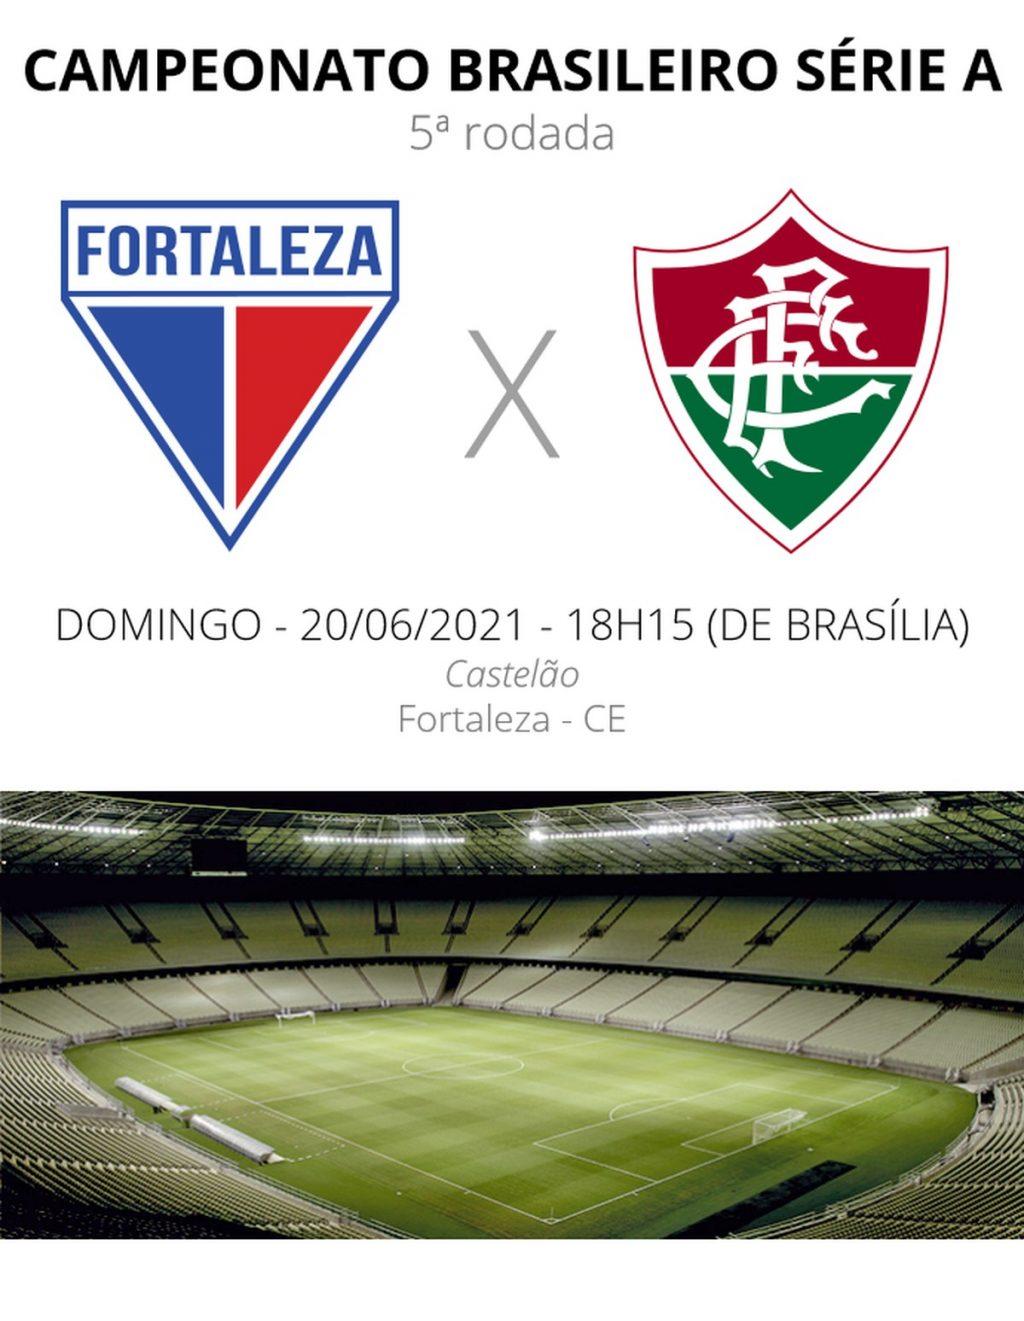 Fortaleza x Fluminense: See where to watch, teams, embezzlement and arbitration |  Brazilian series